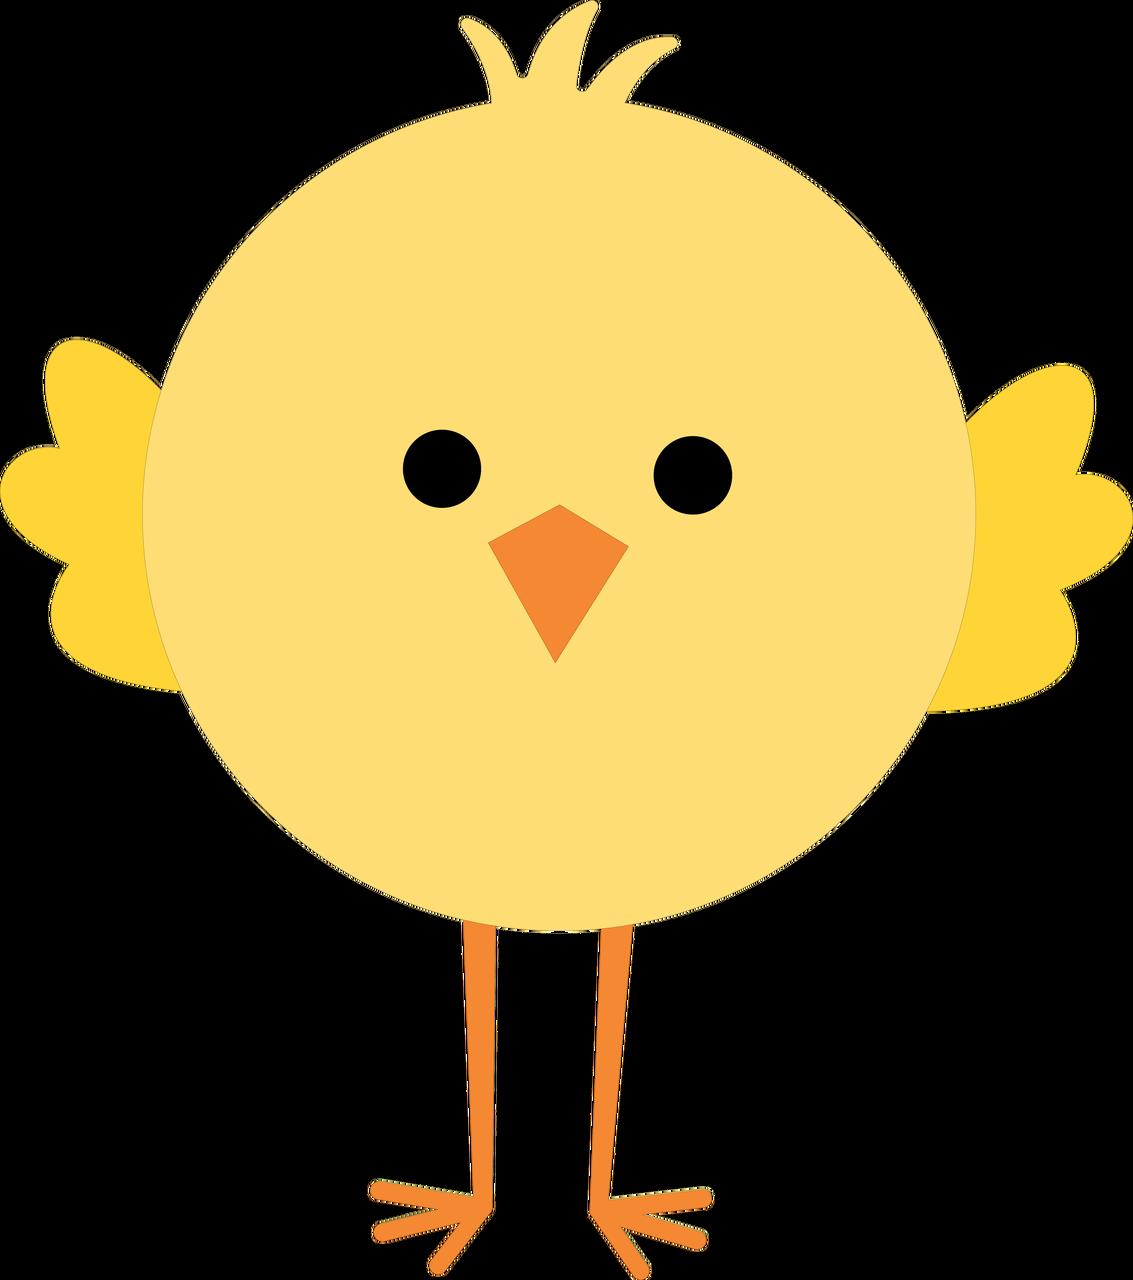 Chick SVG Cut File